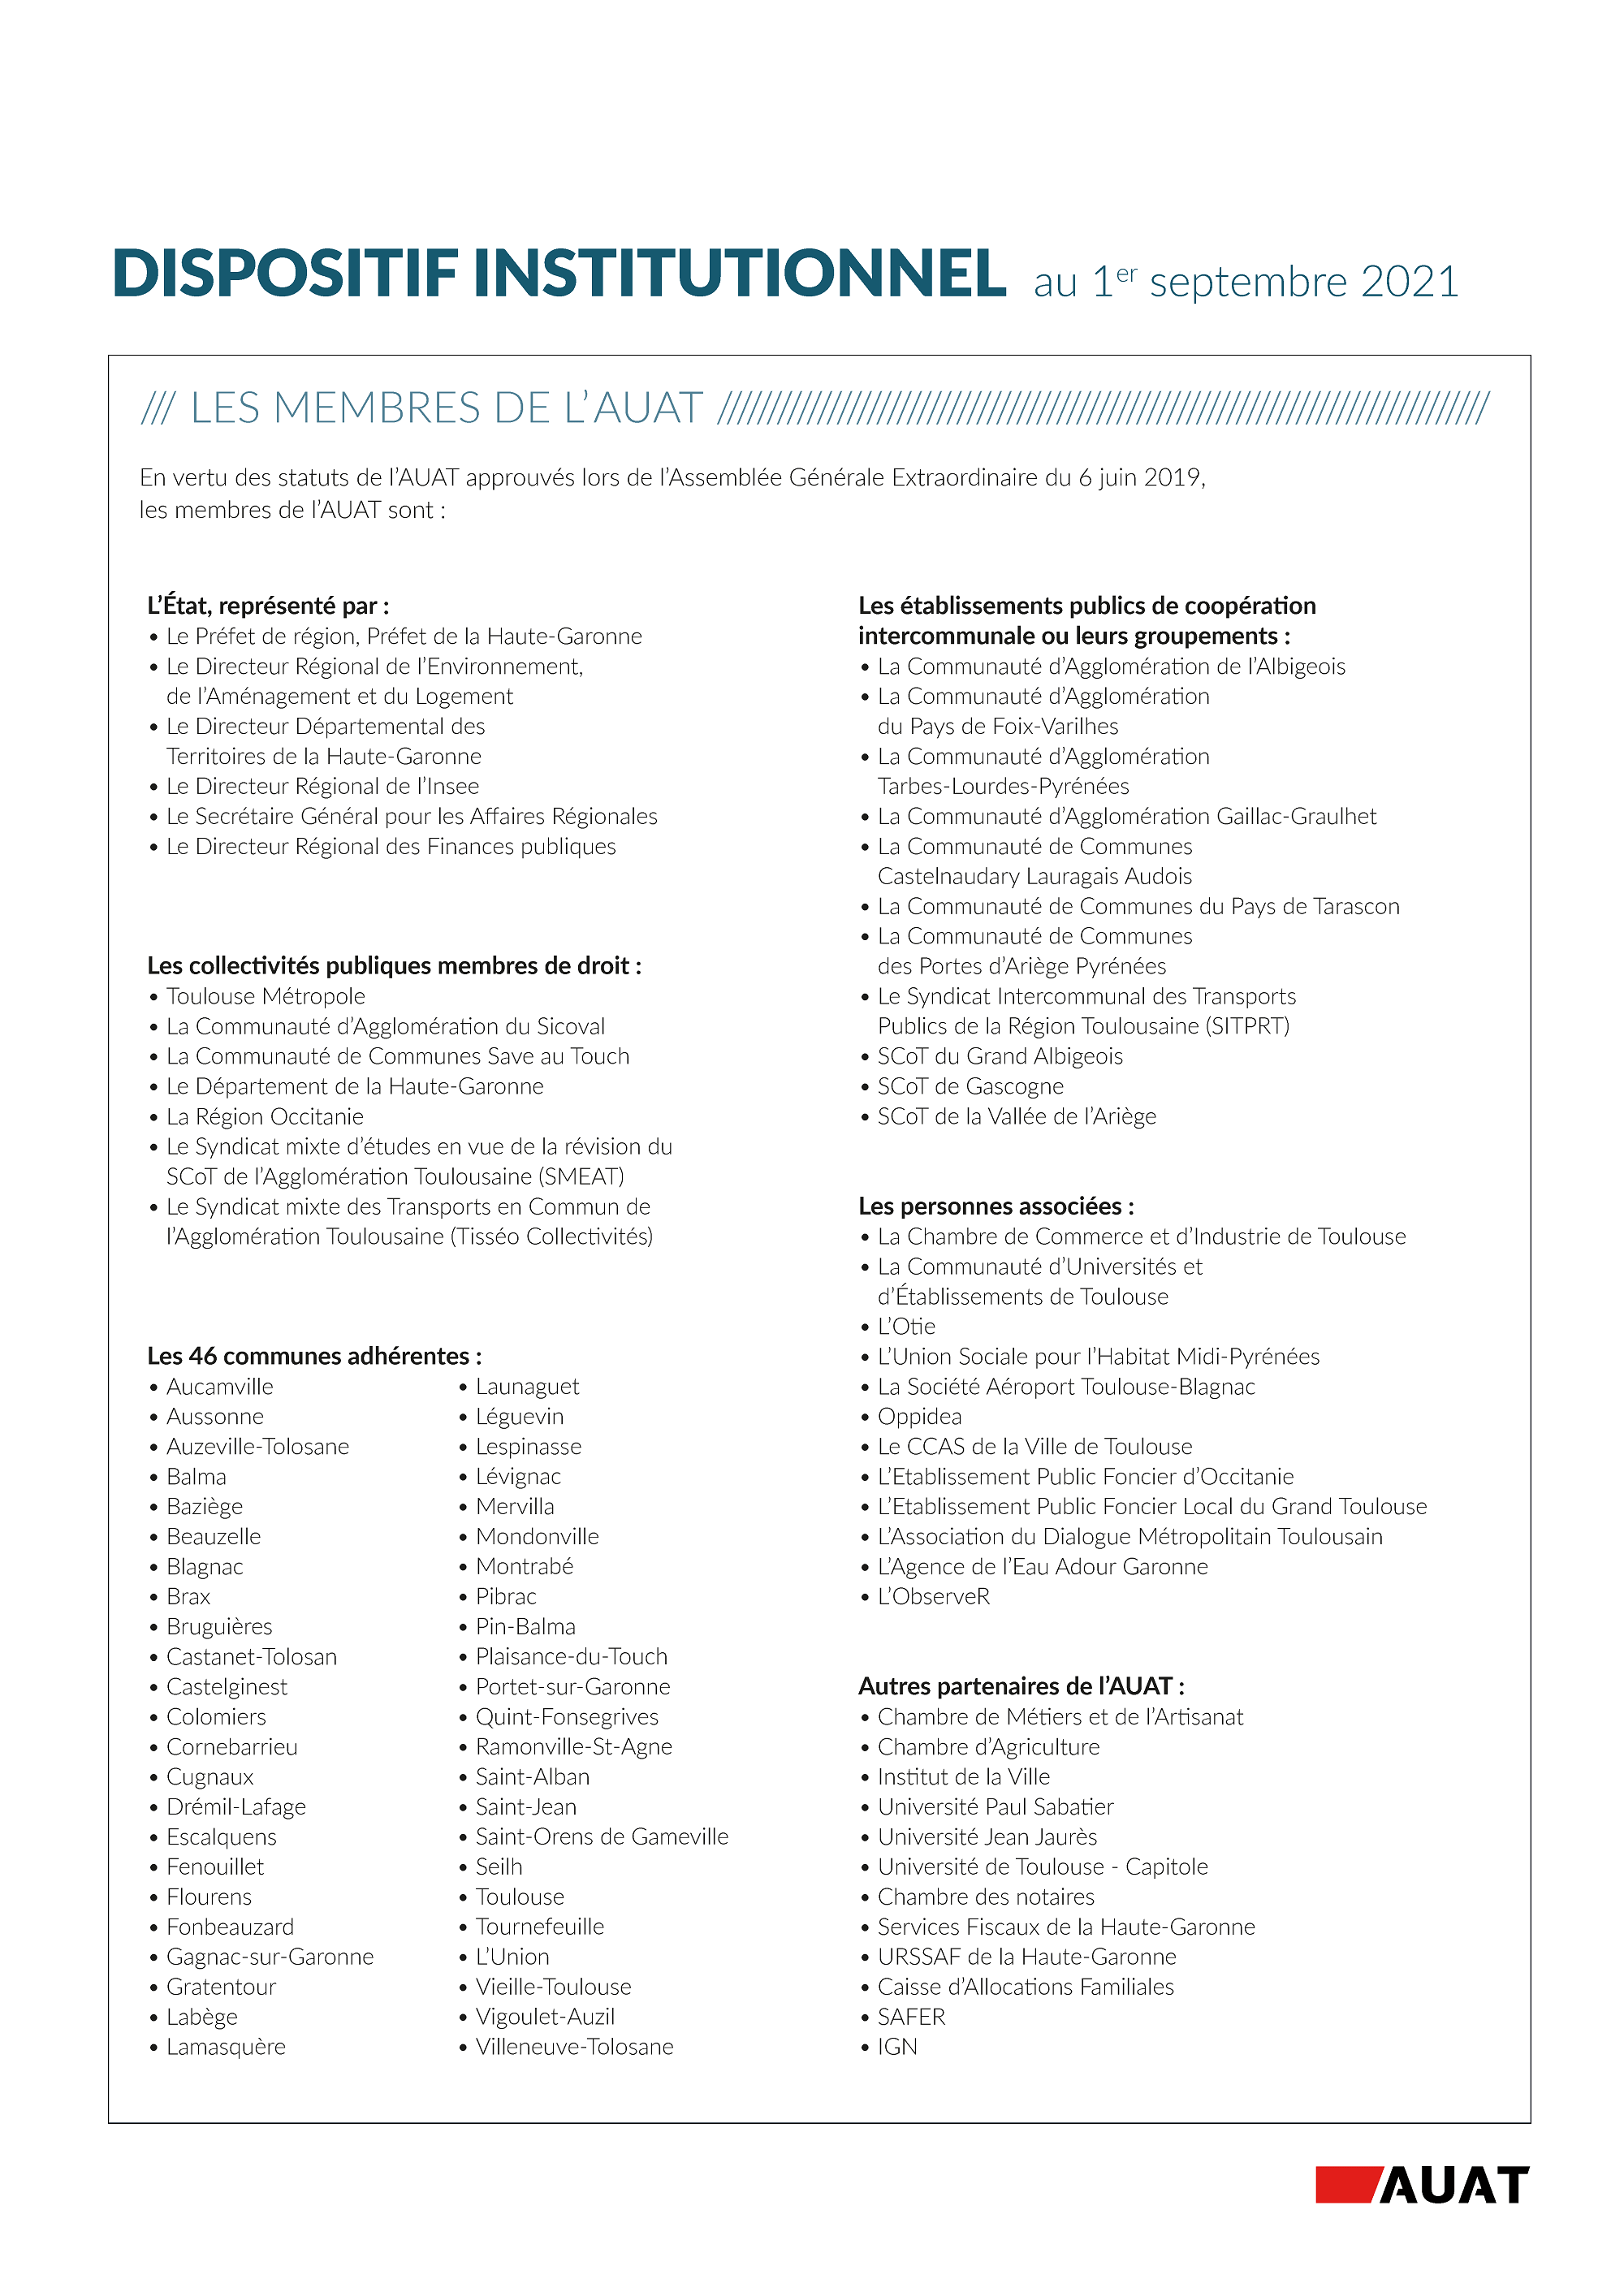 DispositifInstitutionnel-2021-09_Page_1